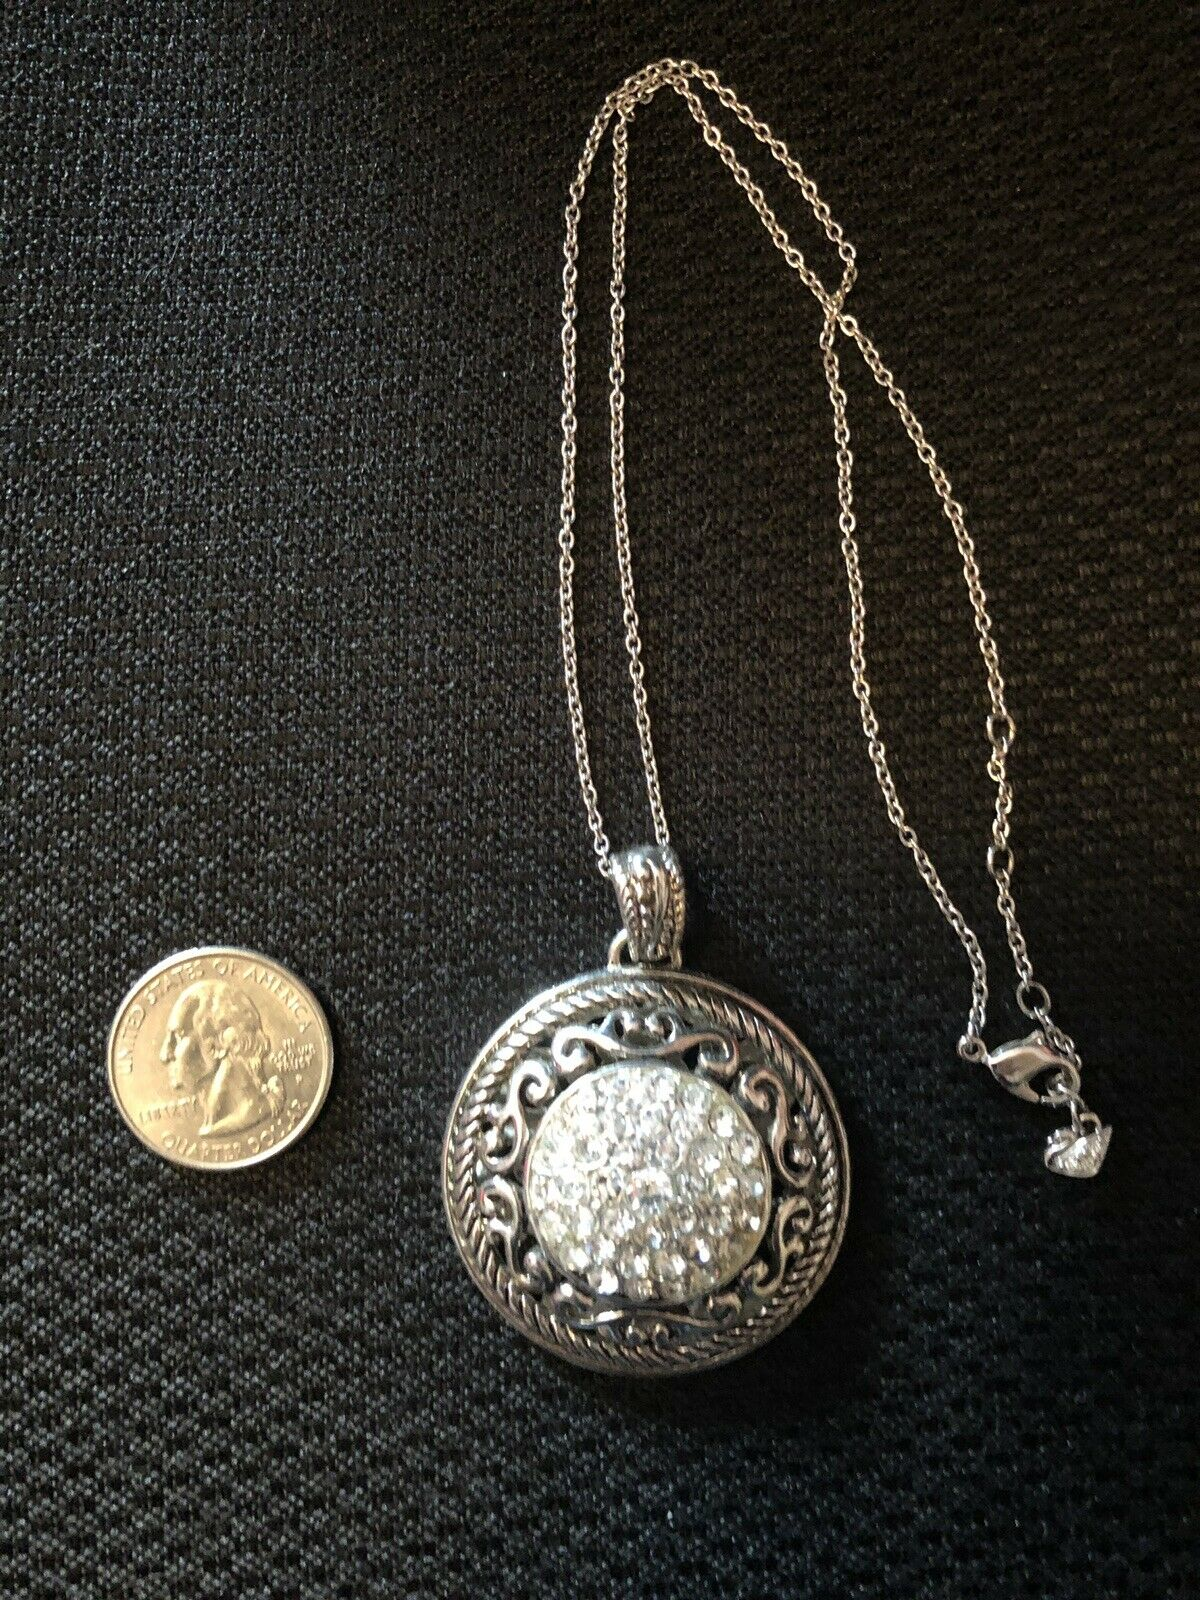 Swarovski Pendant And Chain Authentic